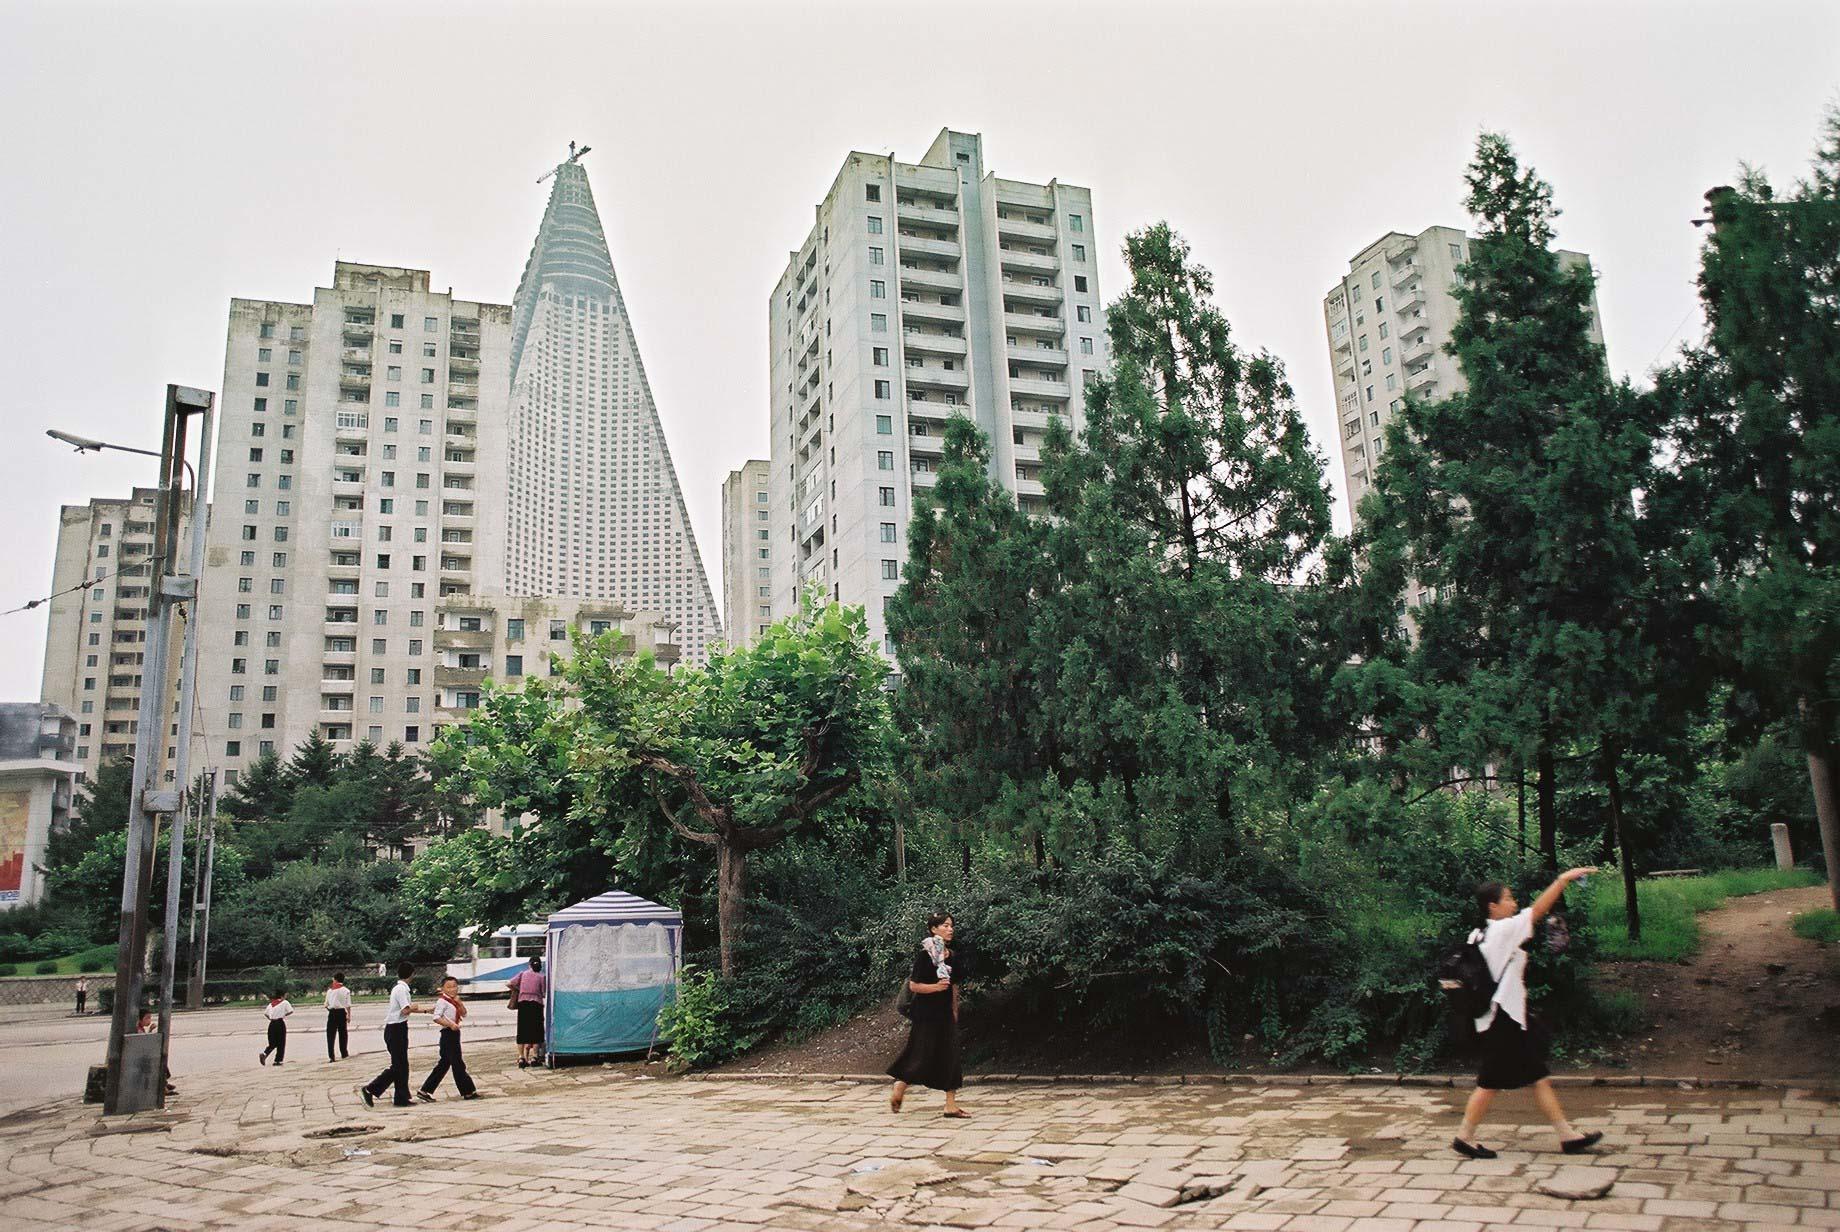 NORTH KOREA 2005